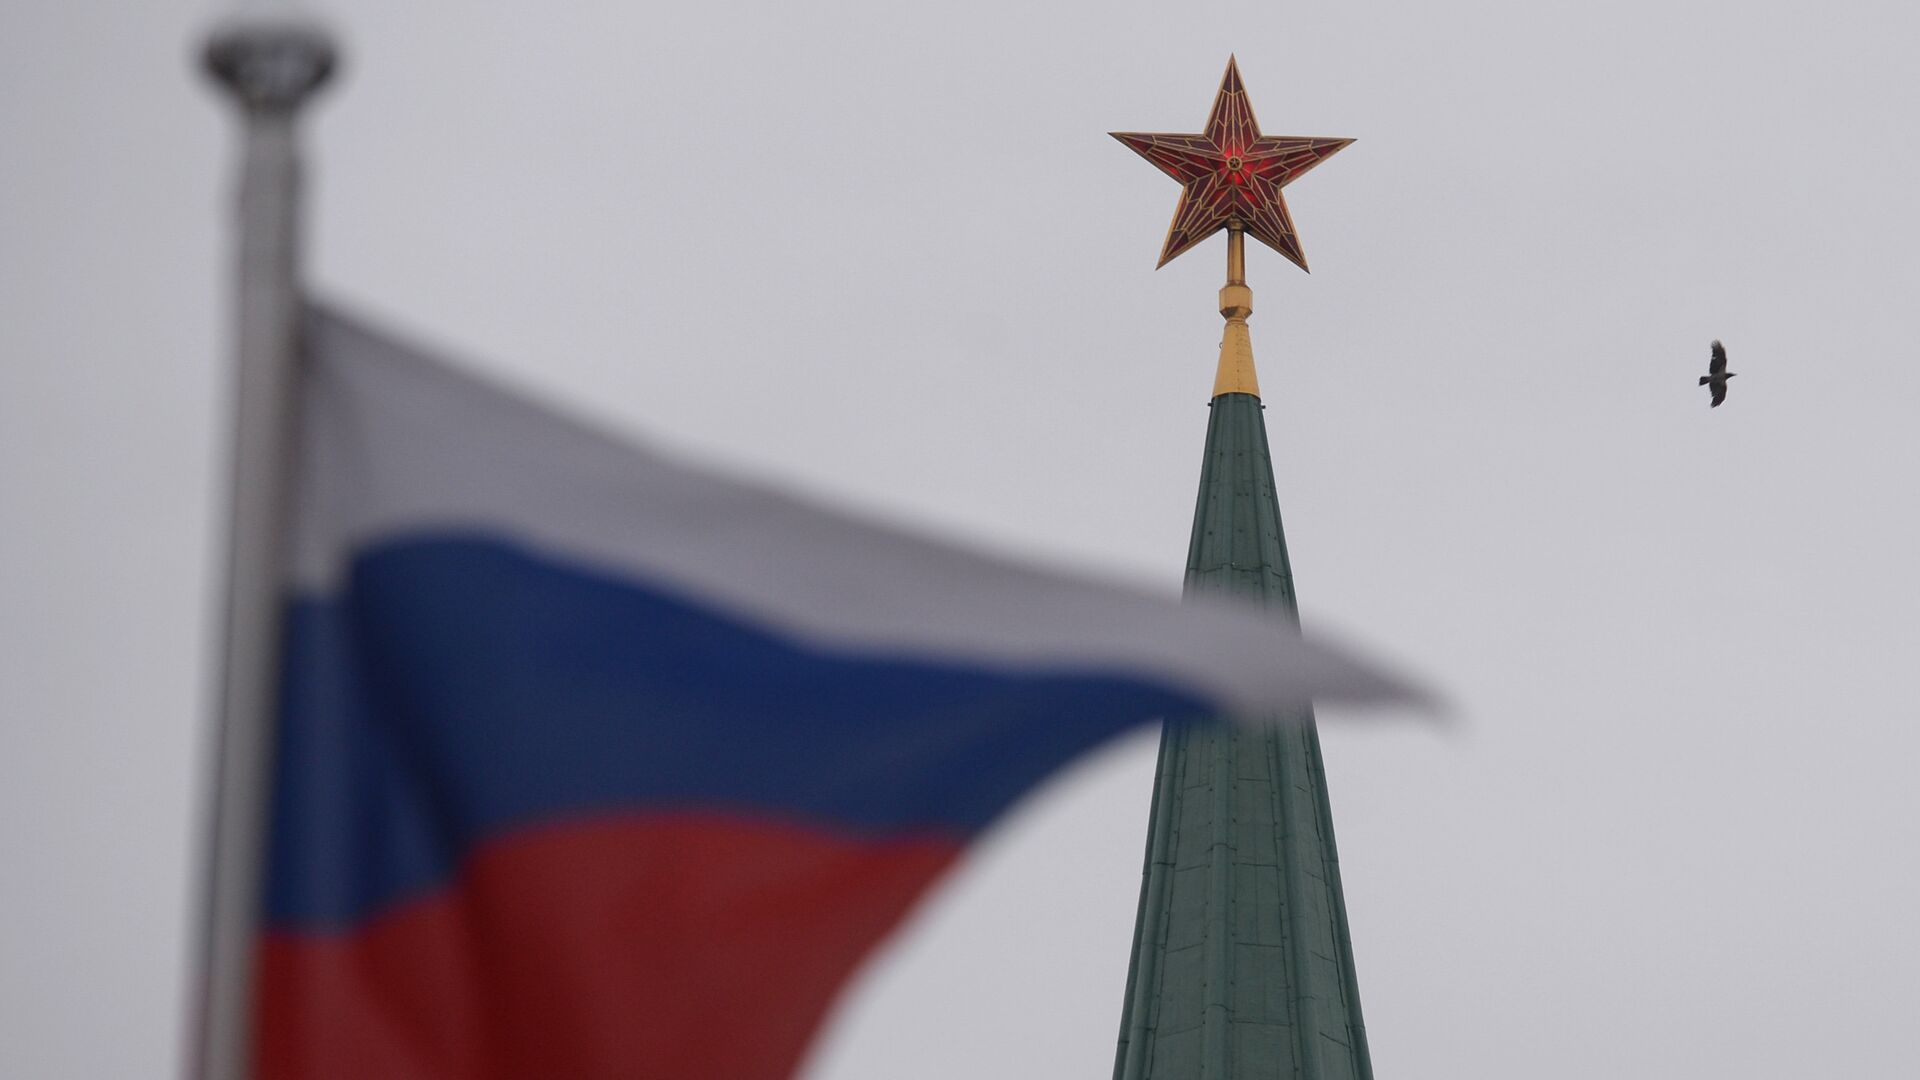 Руска застава се вијори у близини Кремља - Sputnik Србија, 1920, 23.09.2021